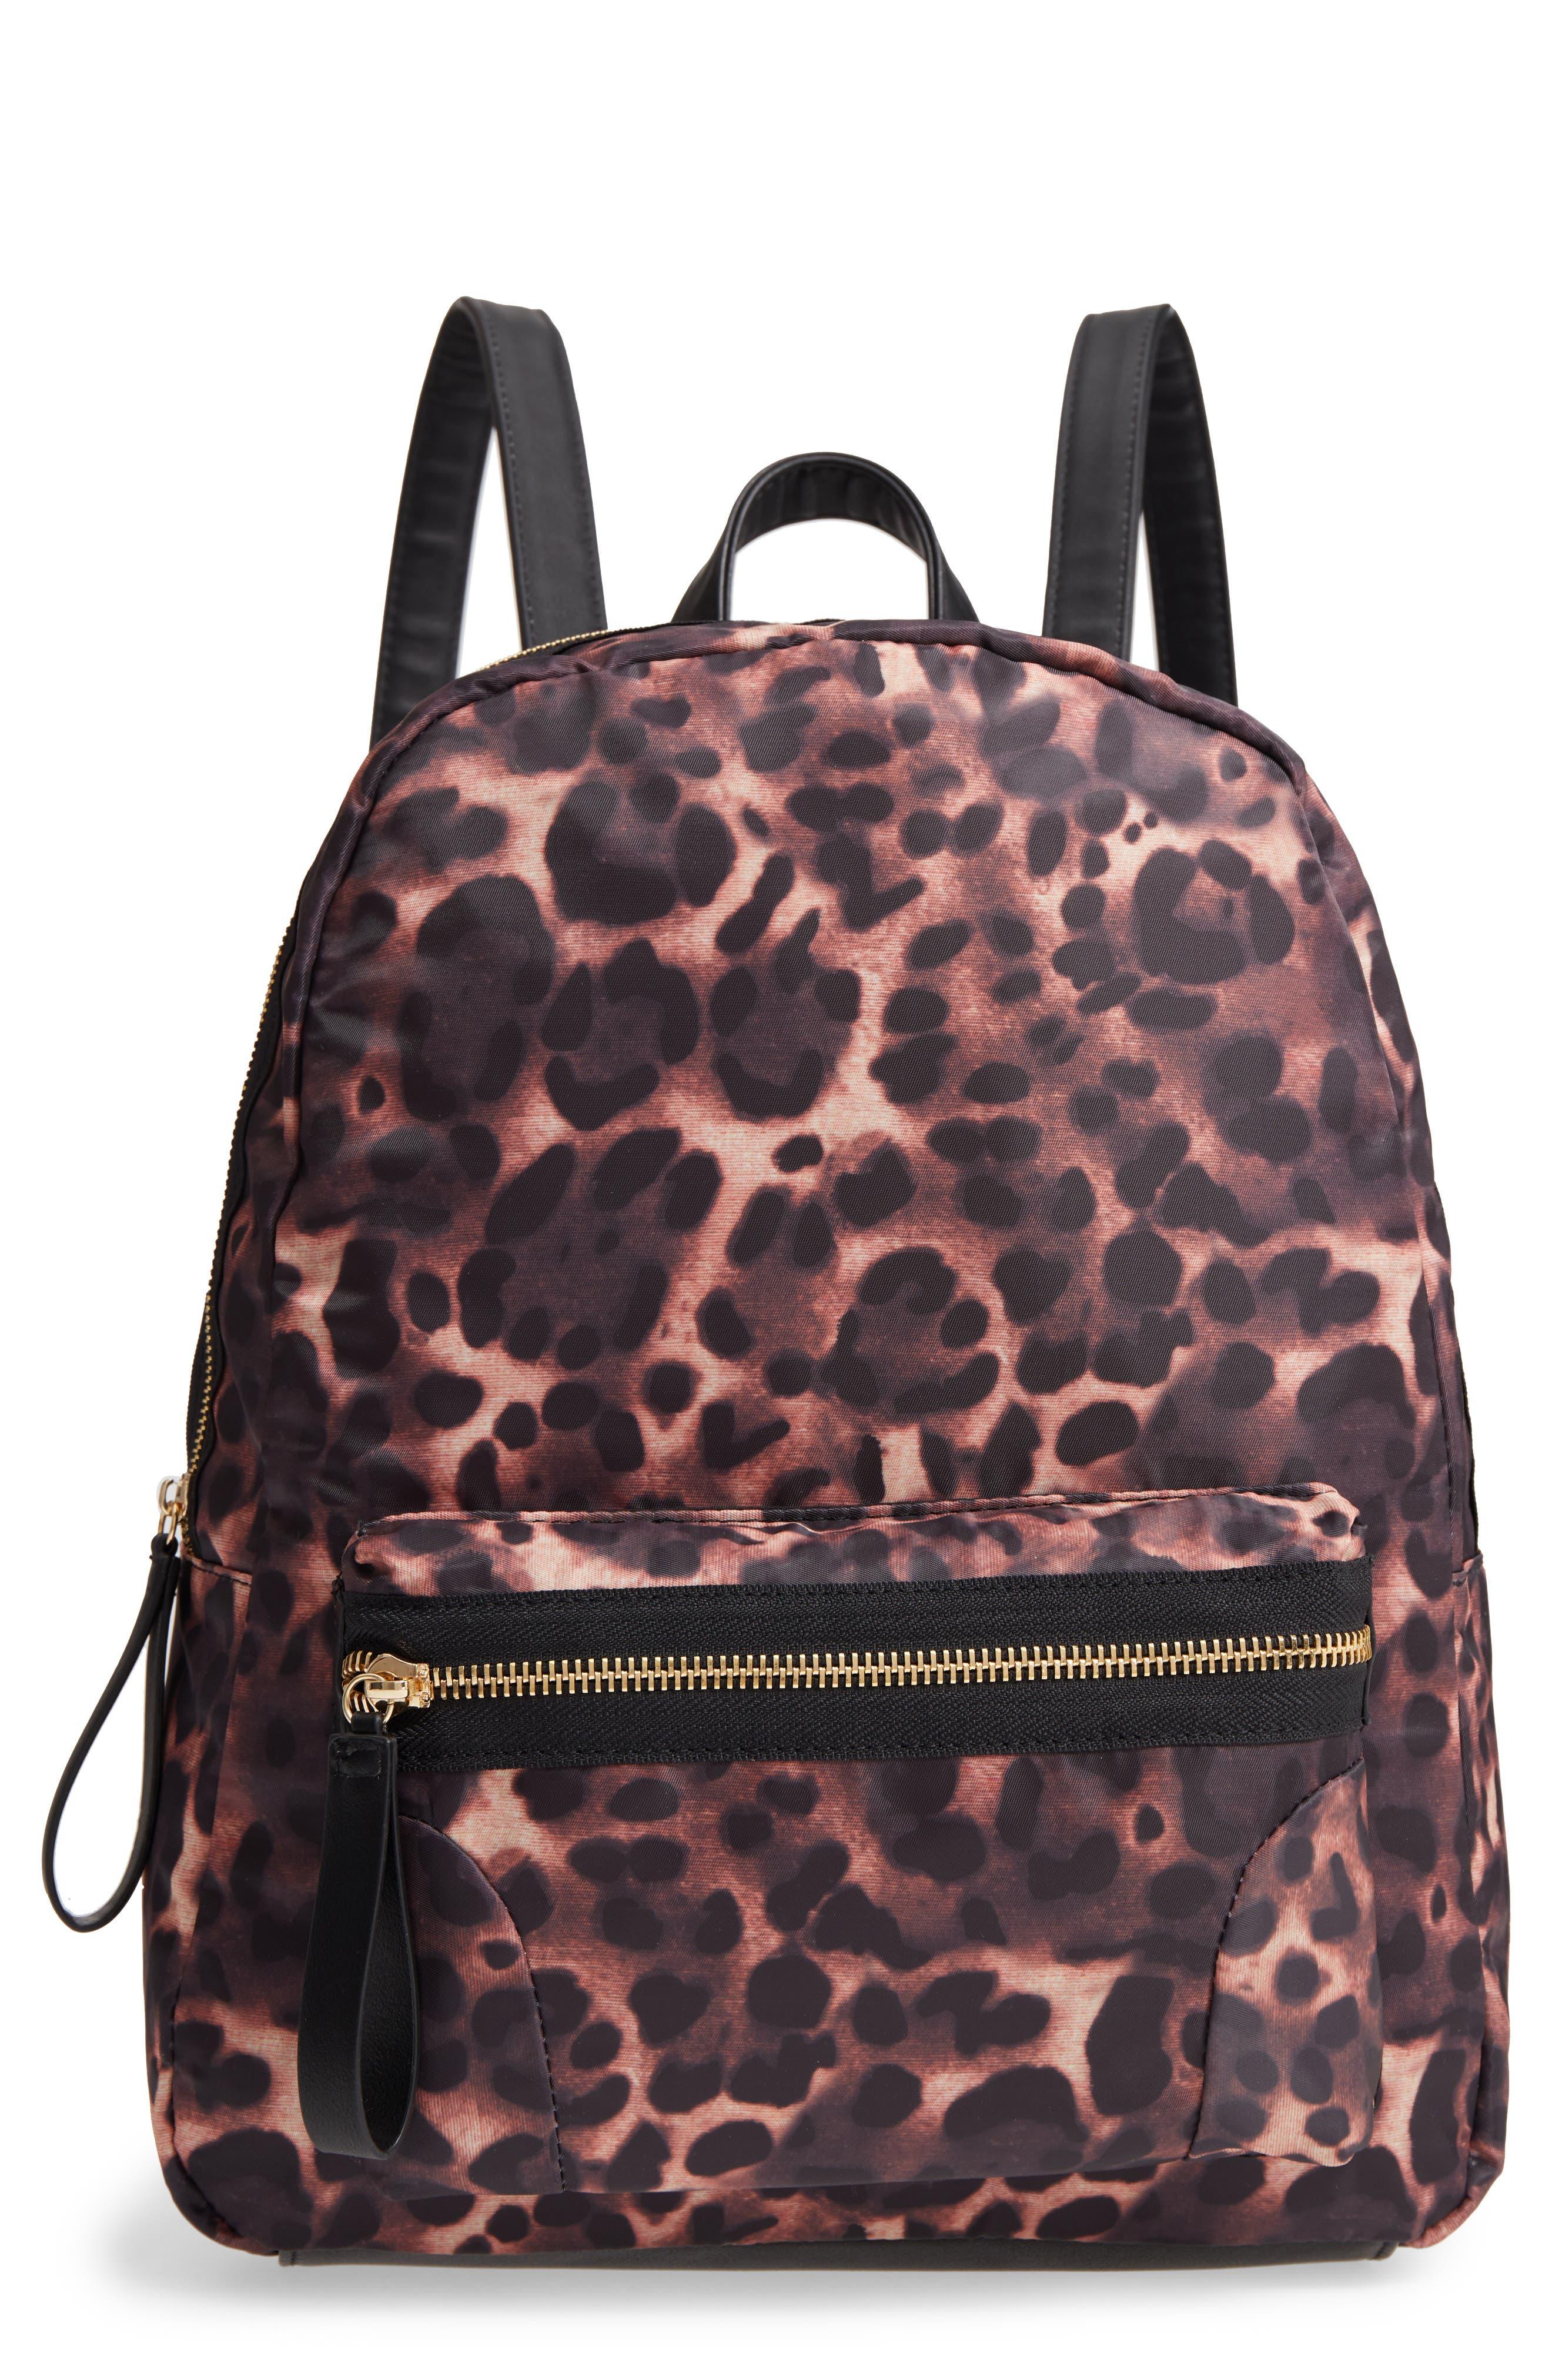 Leopard Print Nylon Backpack,                             Main thumbnail 1, color,                             200